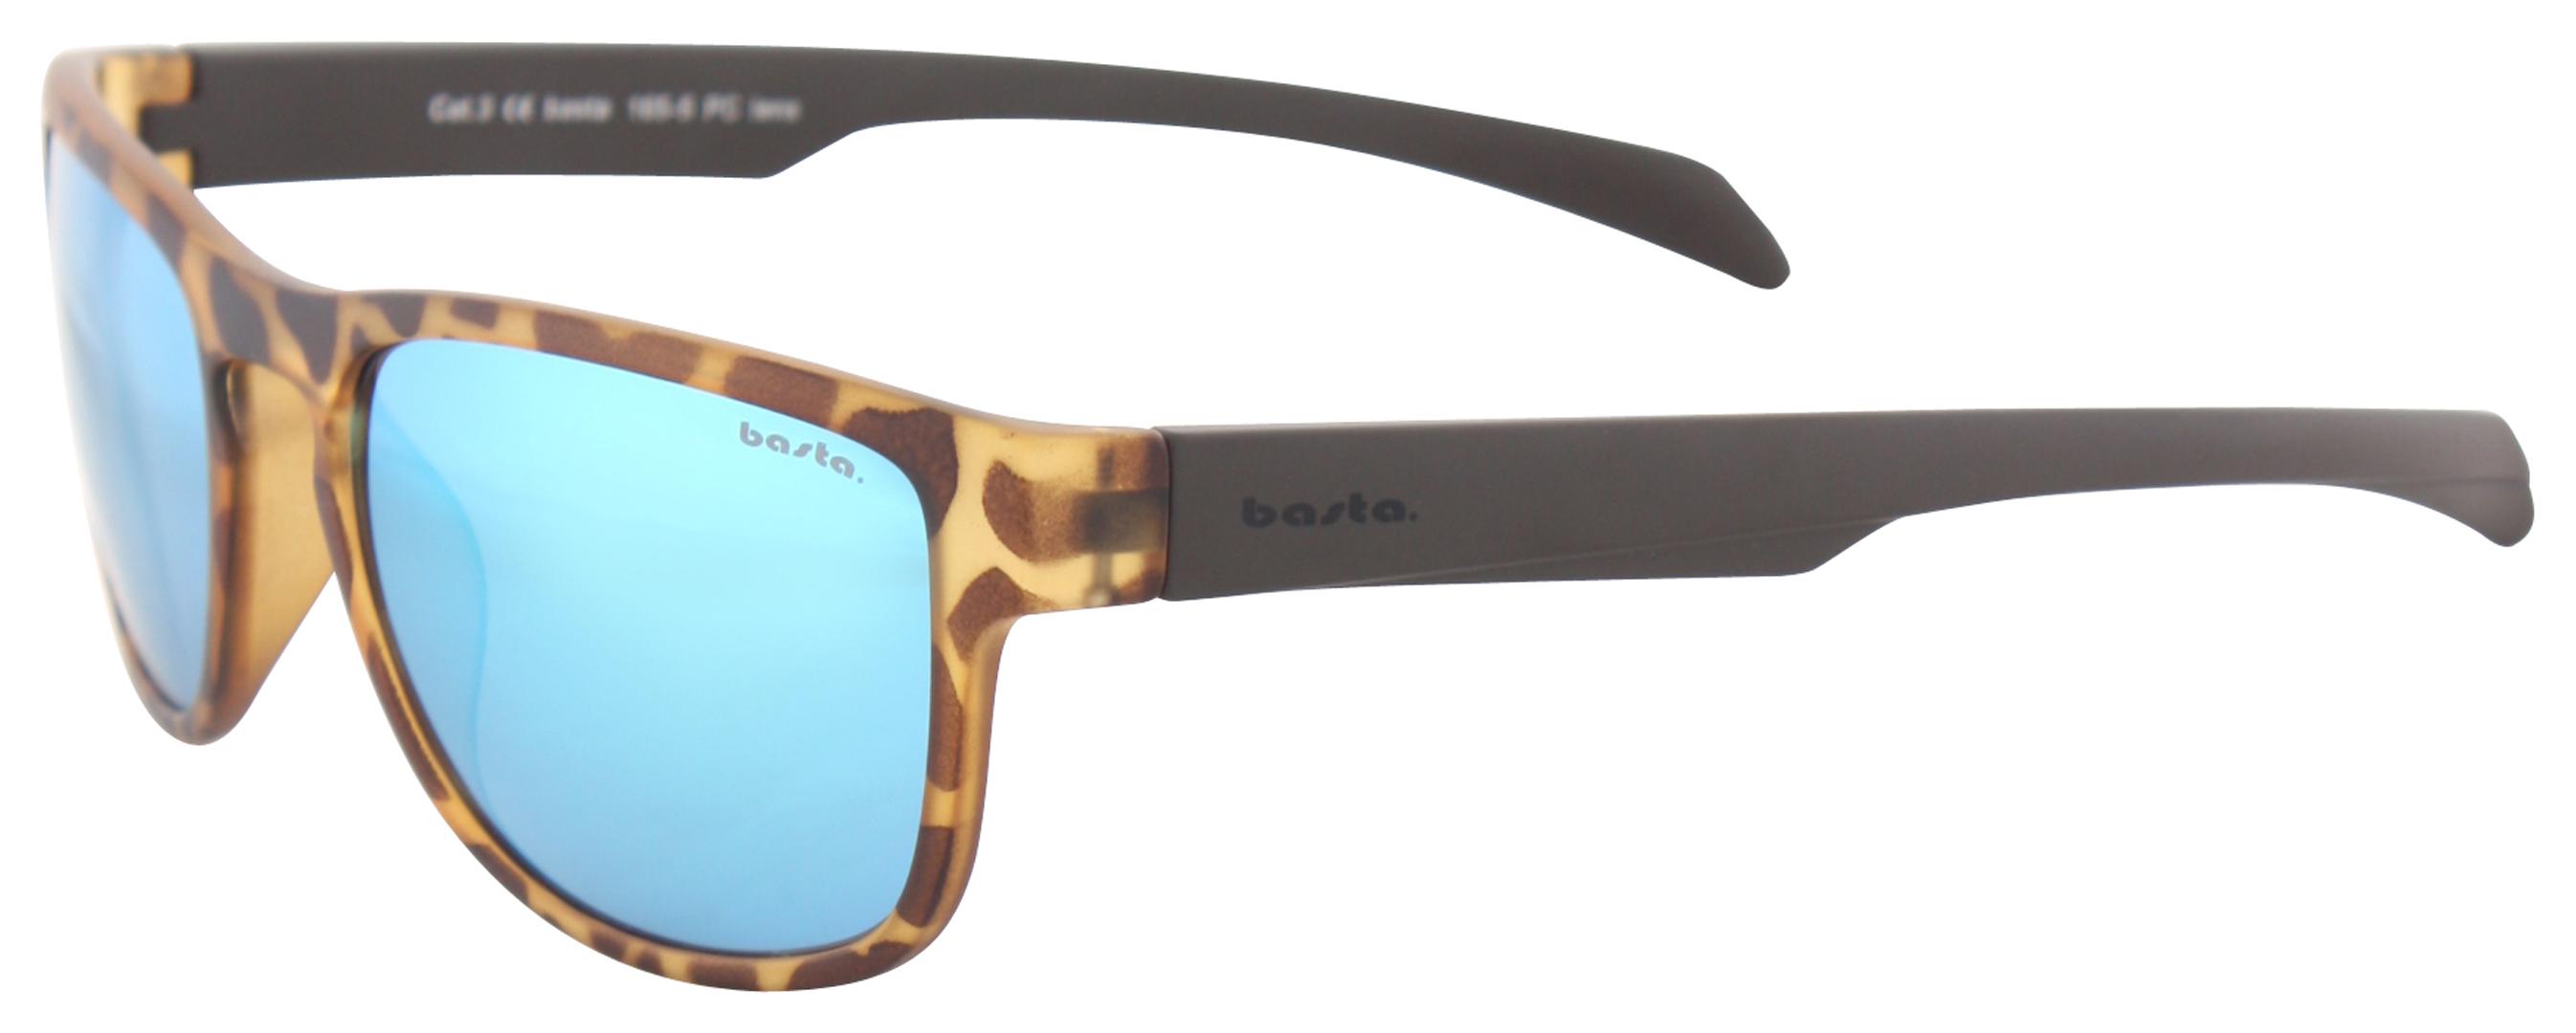 123da6c86f The Best Polarized Sunglasses In The World